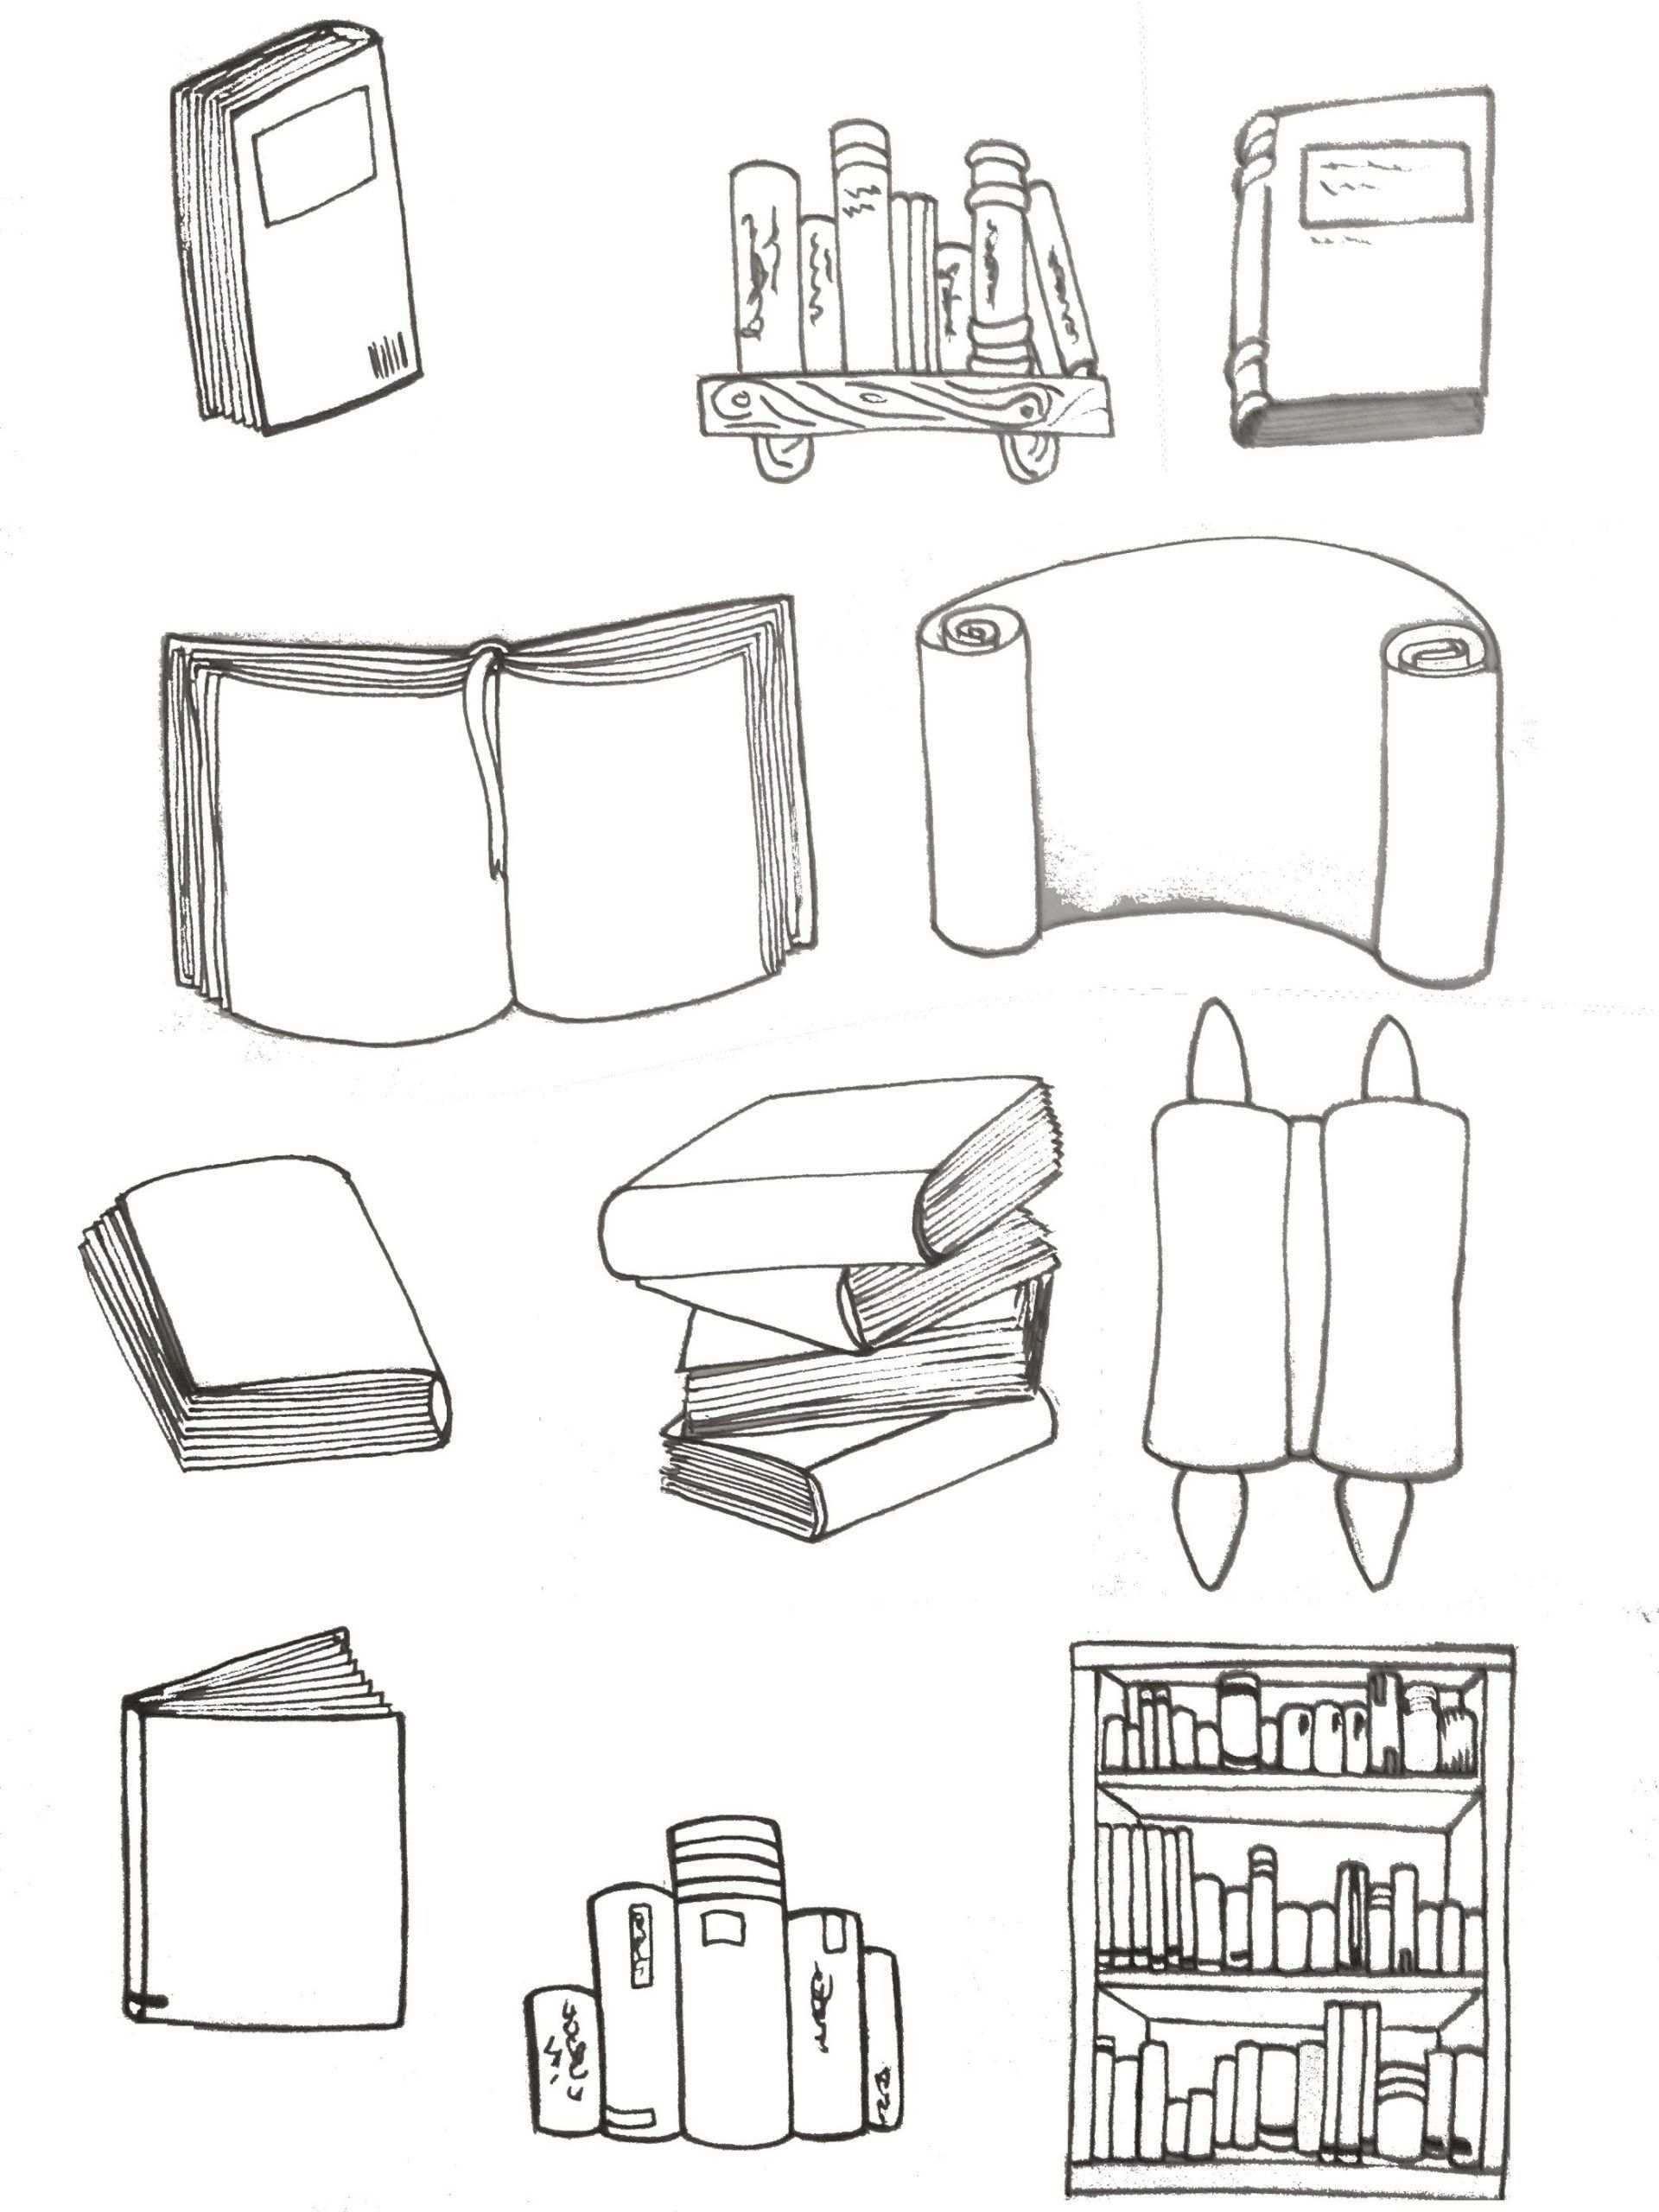 Draw Doodles Viele Vorlagen Fur Ihre Inspiration Und Kreativitat In 2020 Doodle Books Book Drawing Bullet Journal Doodles